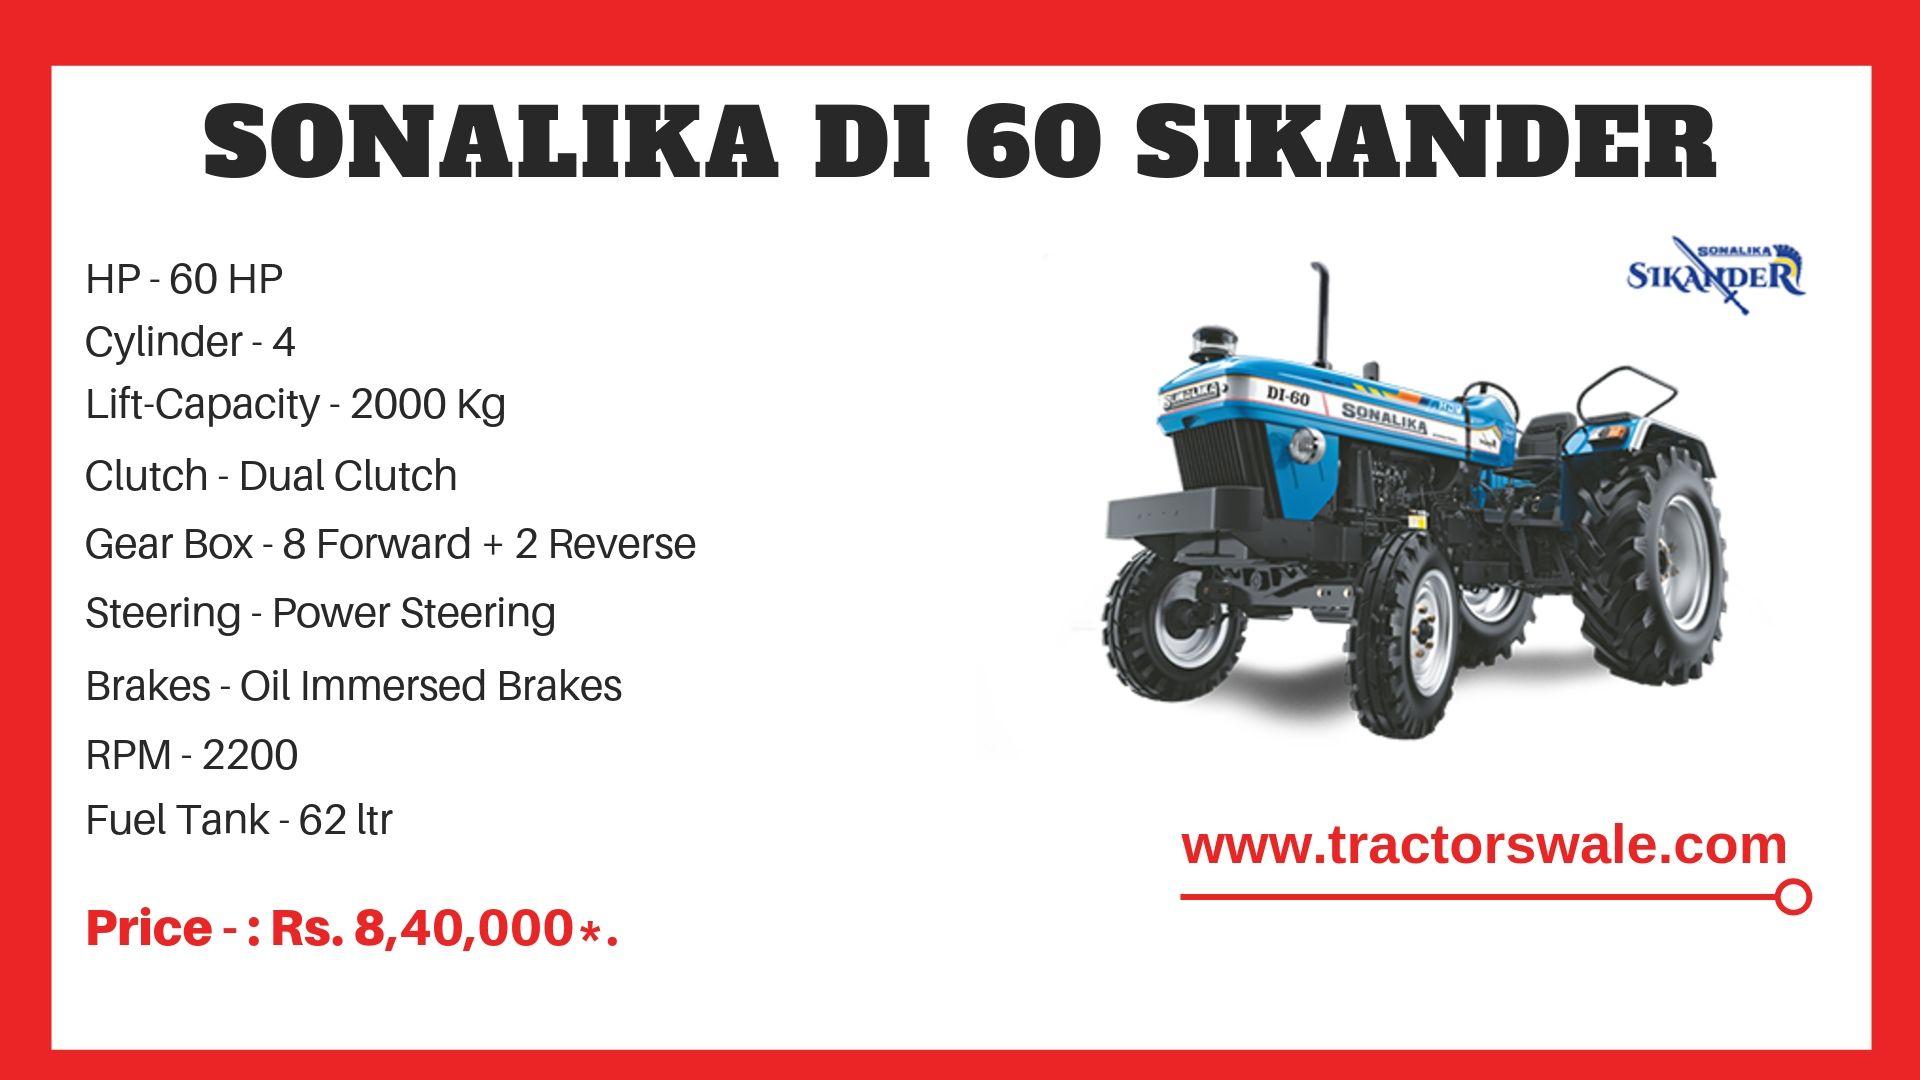 Sonalika DI 60 SIKANDER tractor specs